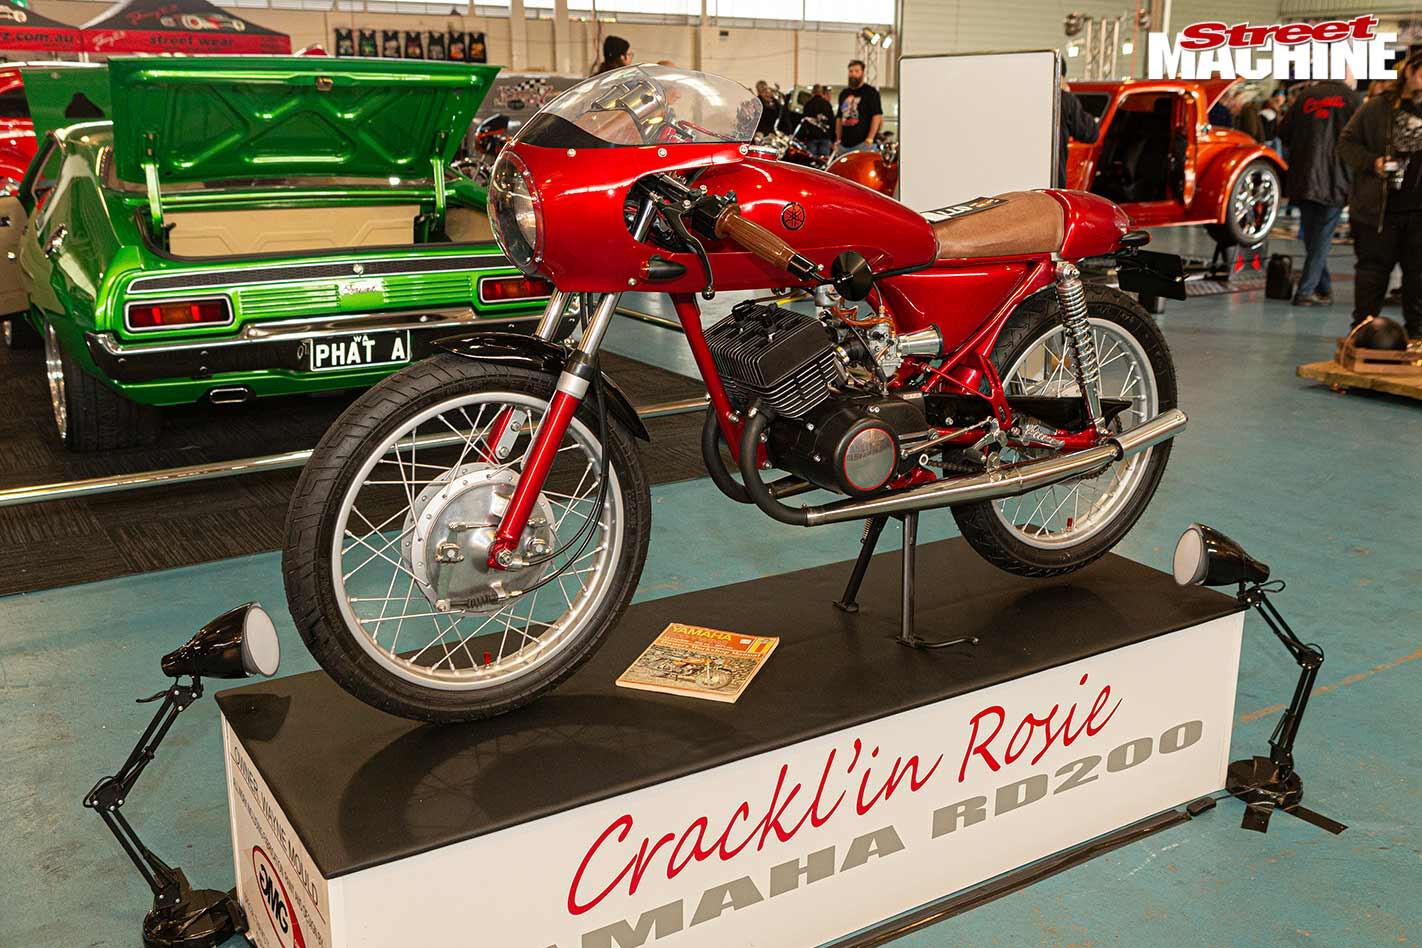 Yamaha RD200 Cracklin Rosie motorcycle